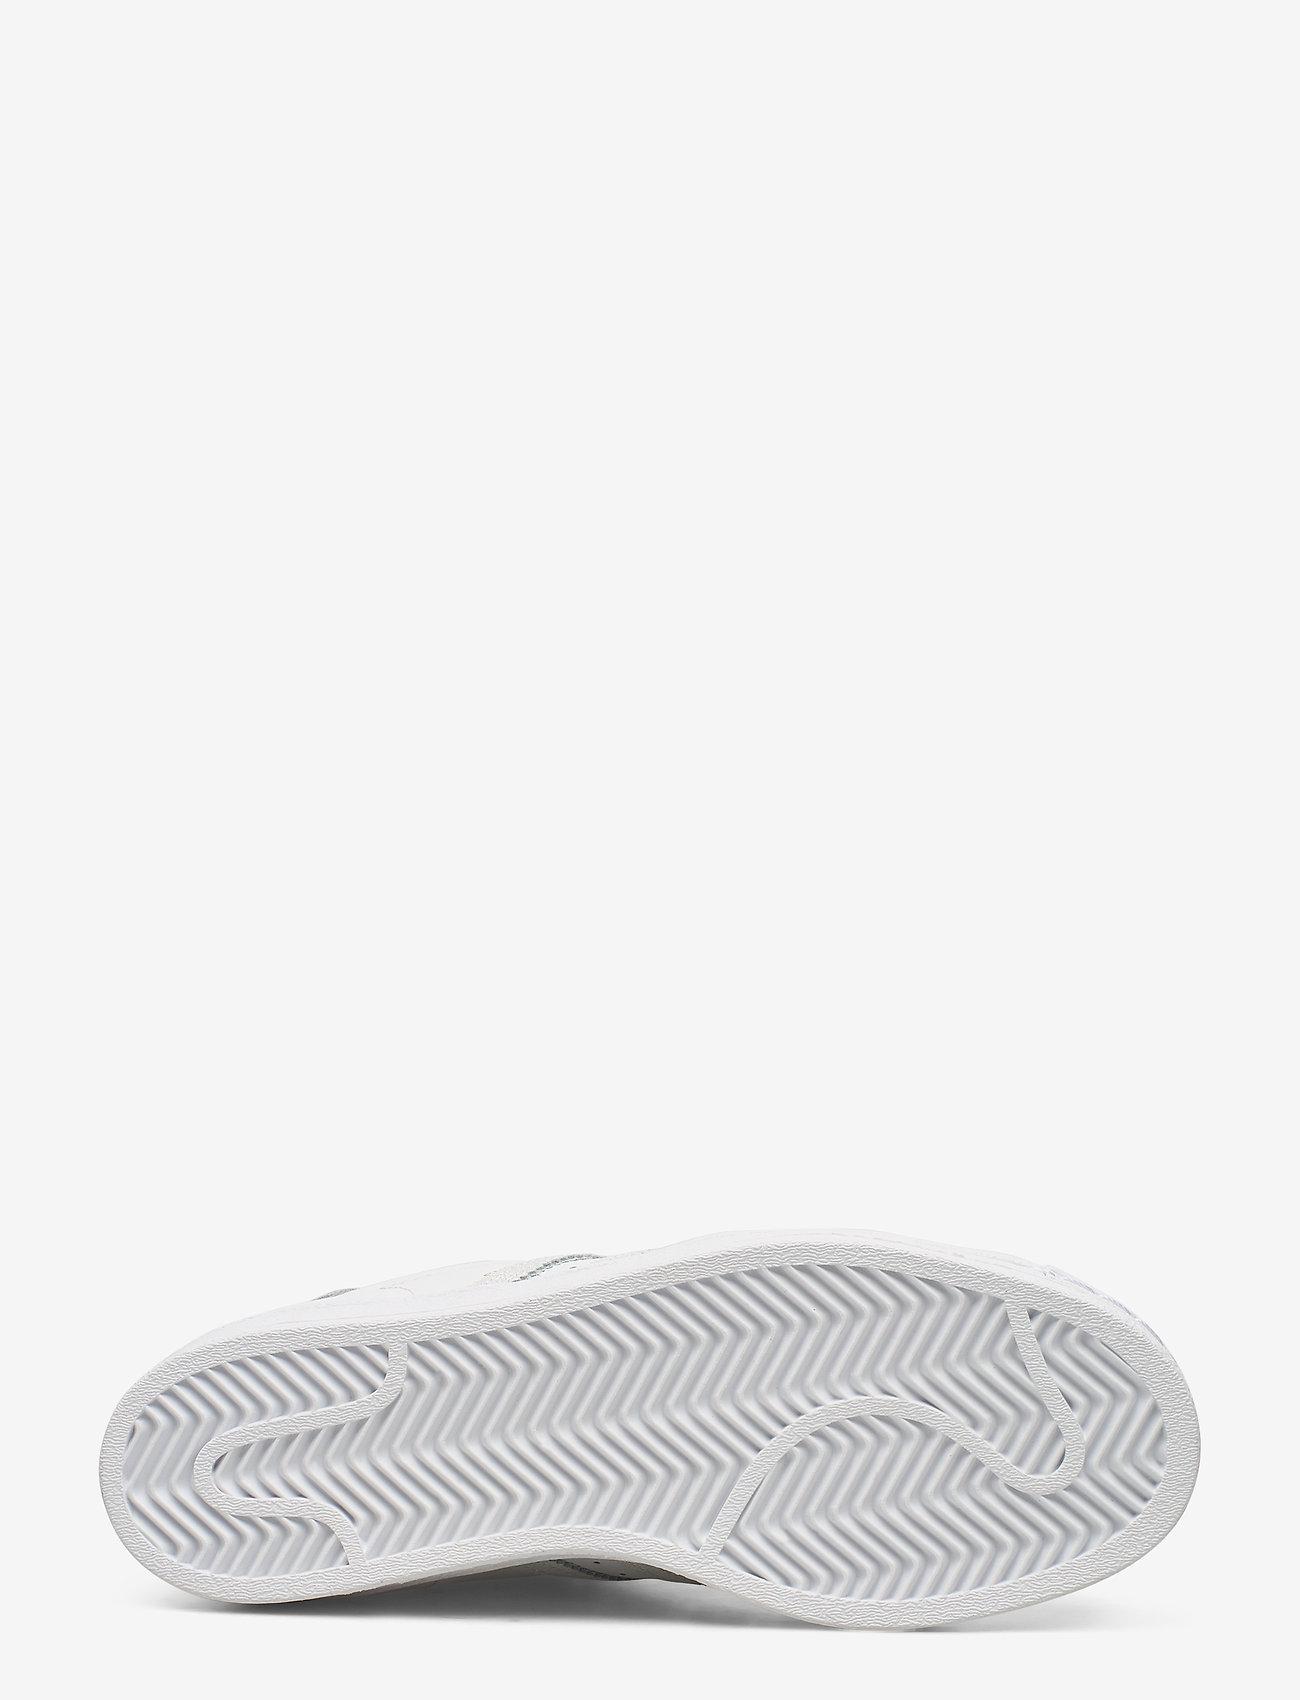 Superstar W (Ftwwht/ftwwht/cblack) - adidas Originals